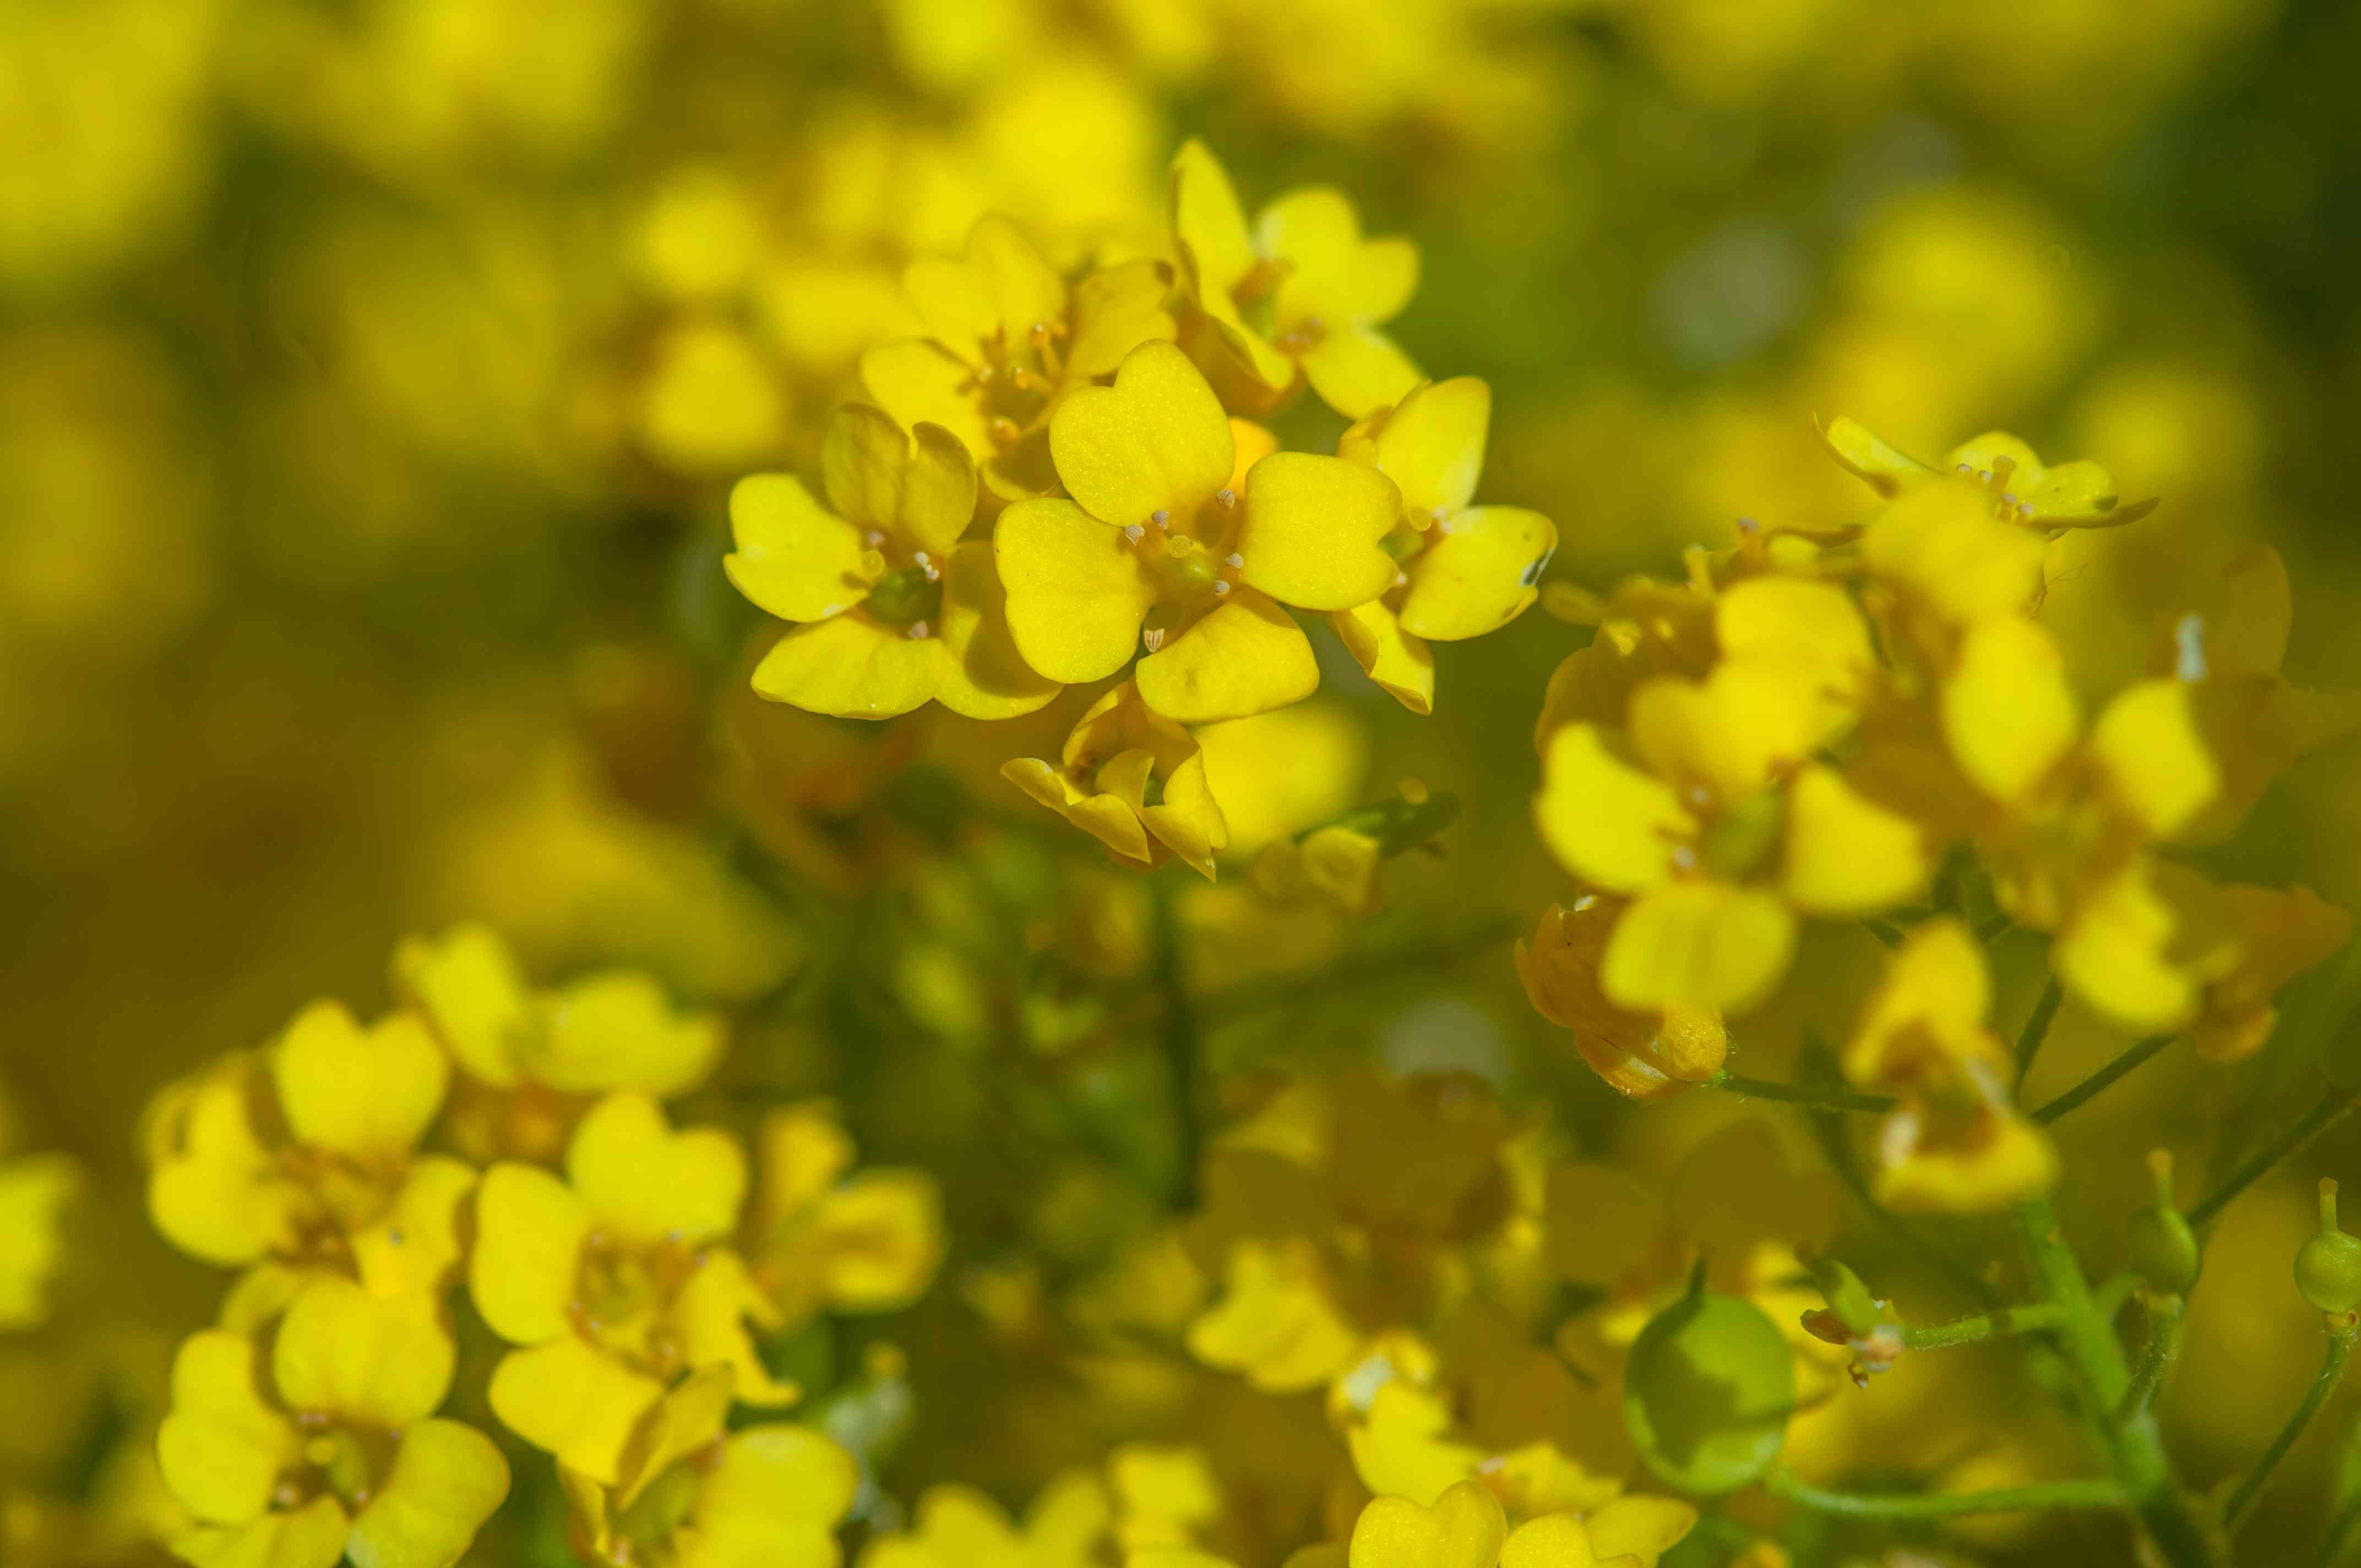 Yellow alyssum flowers in sunlight closeup